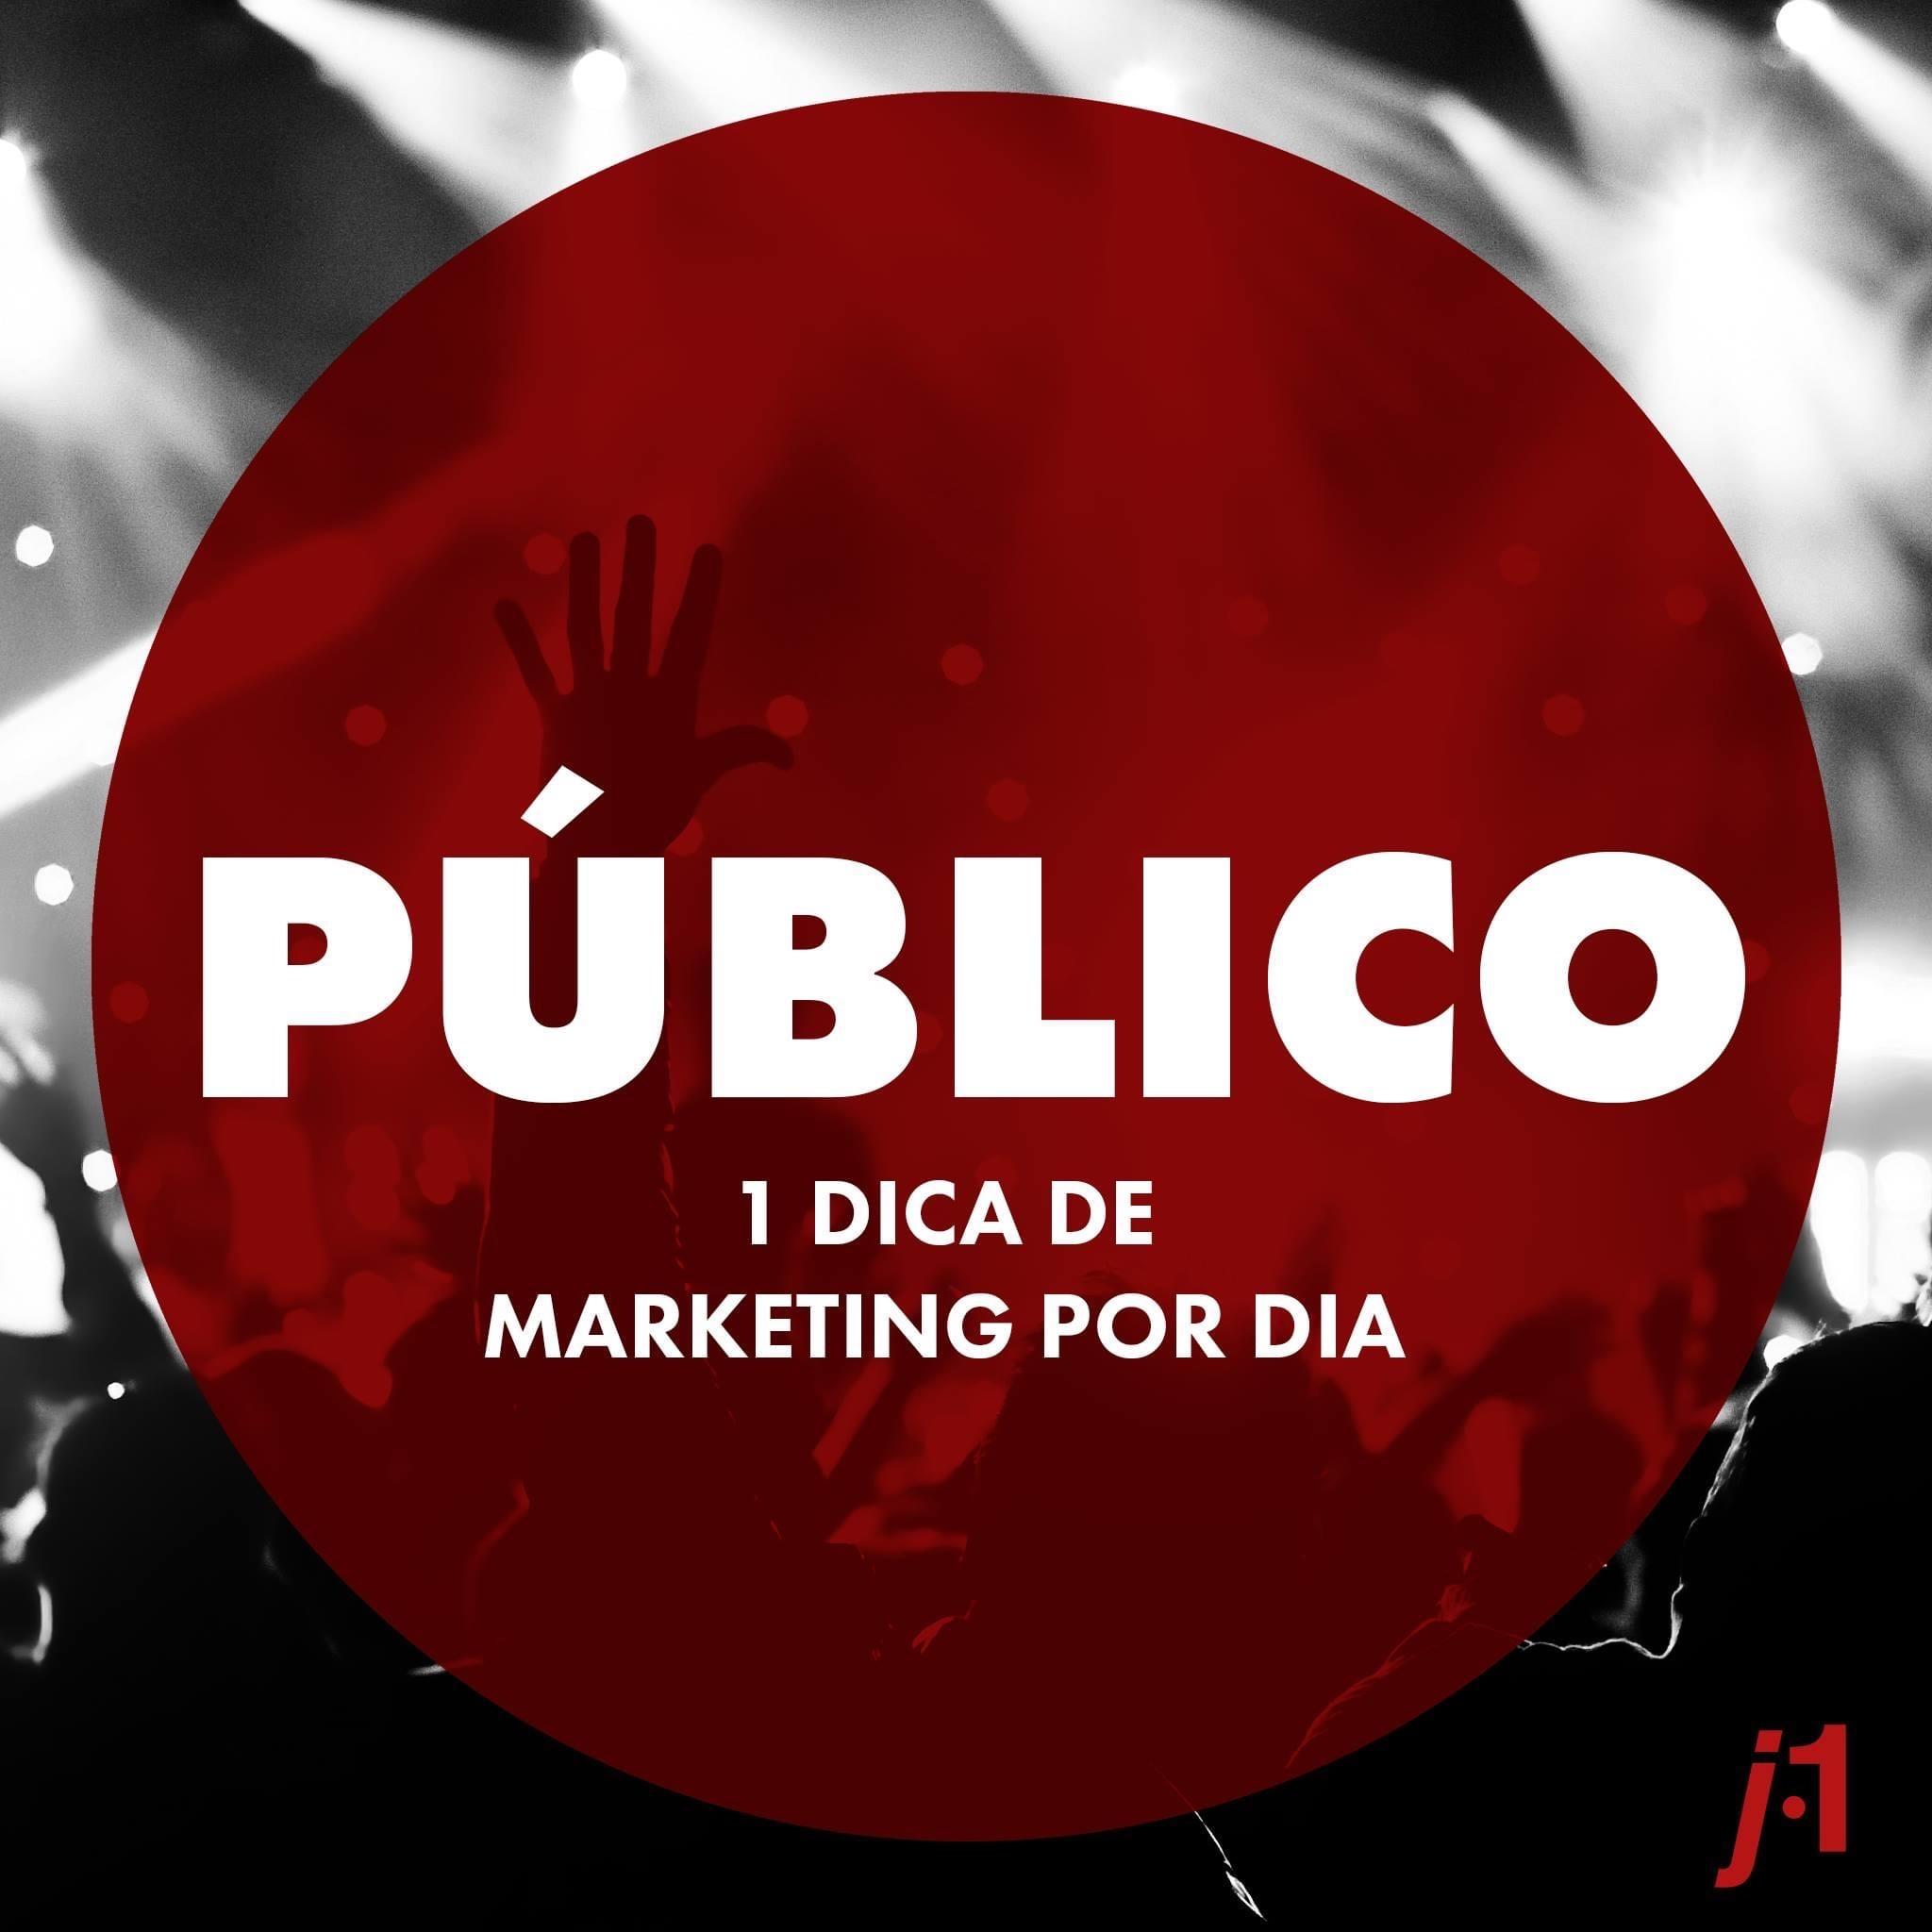 Dicas de Marketing - Público